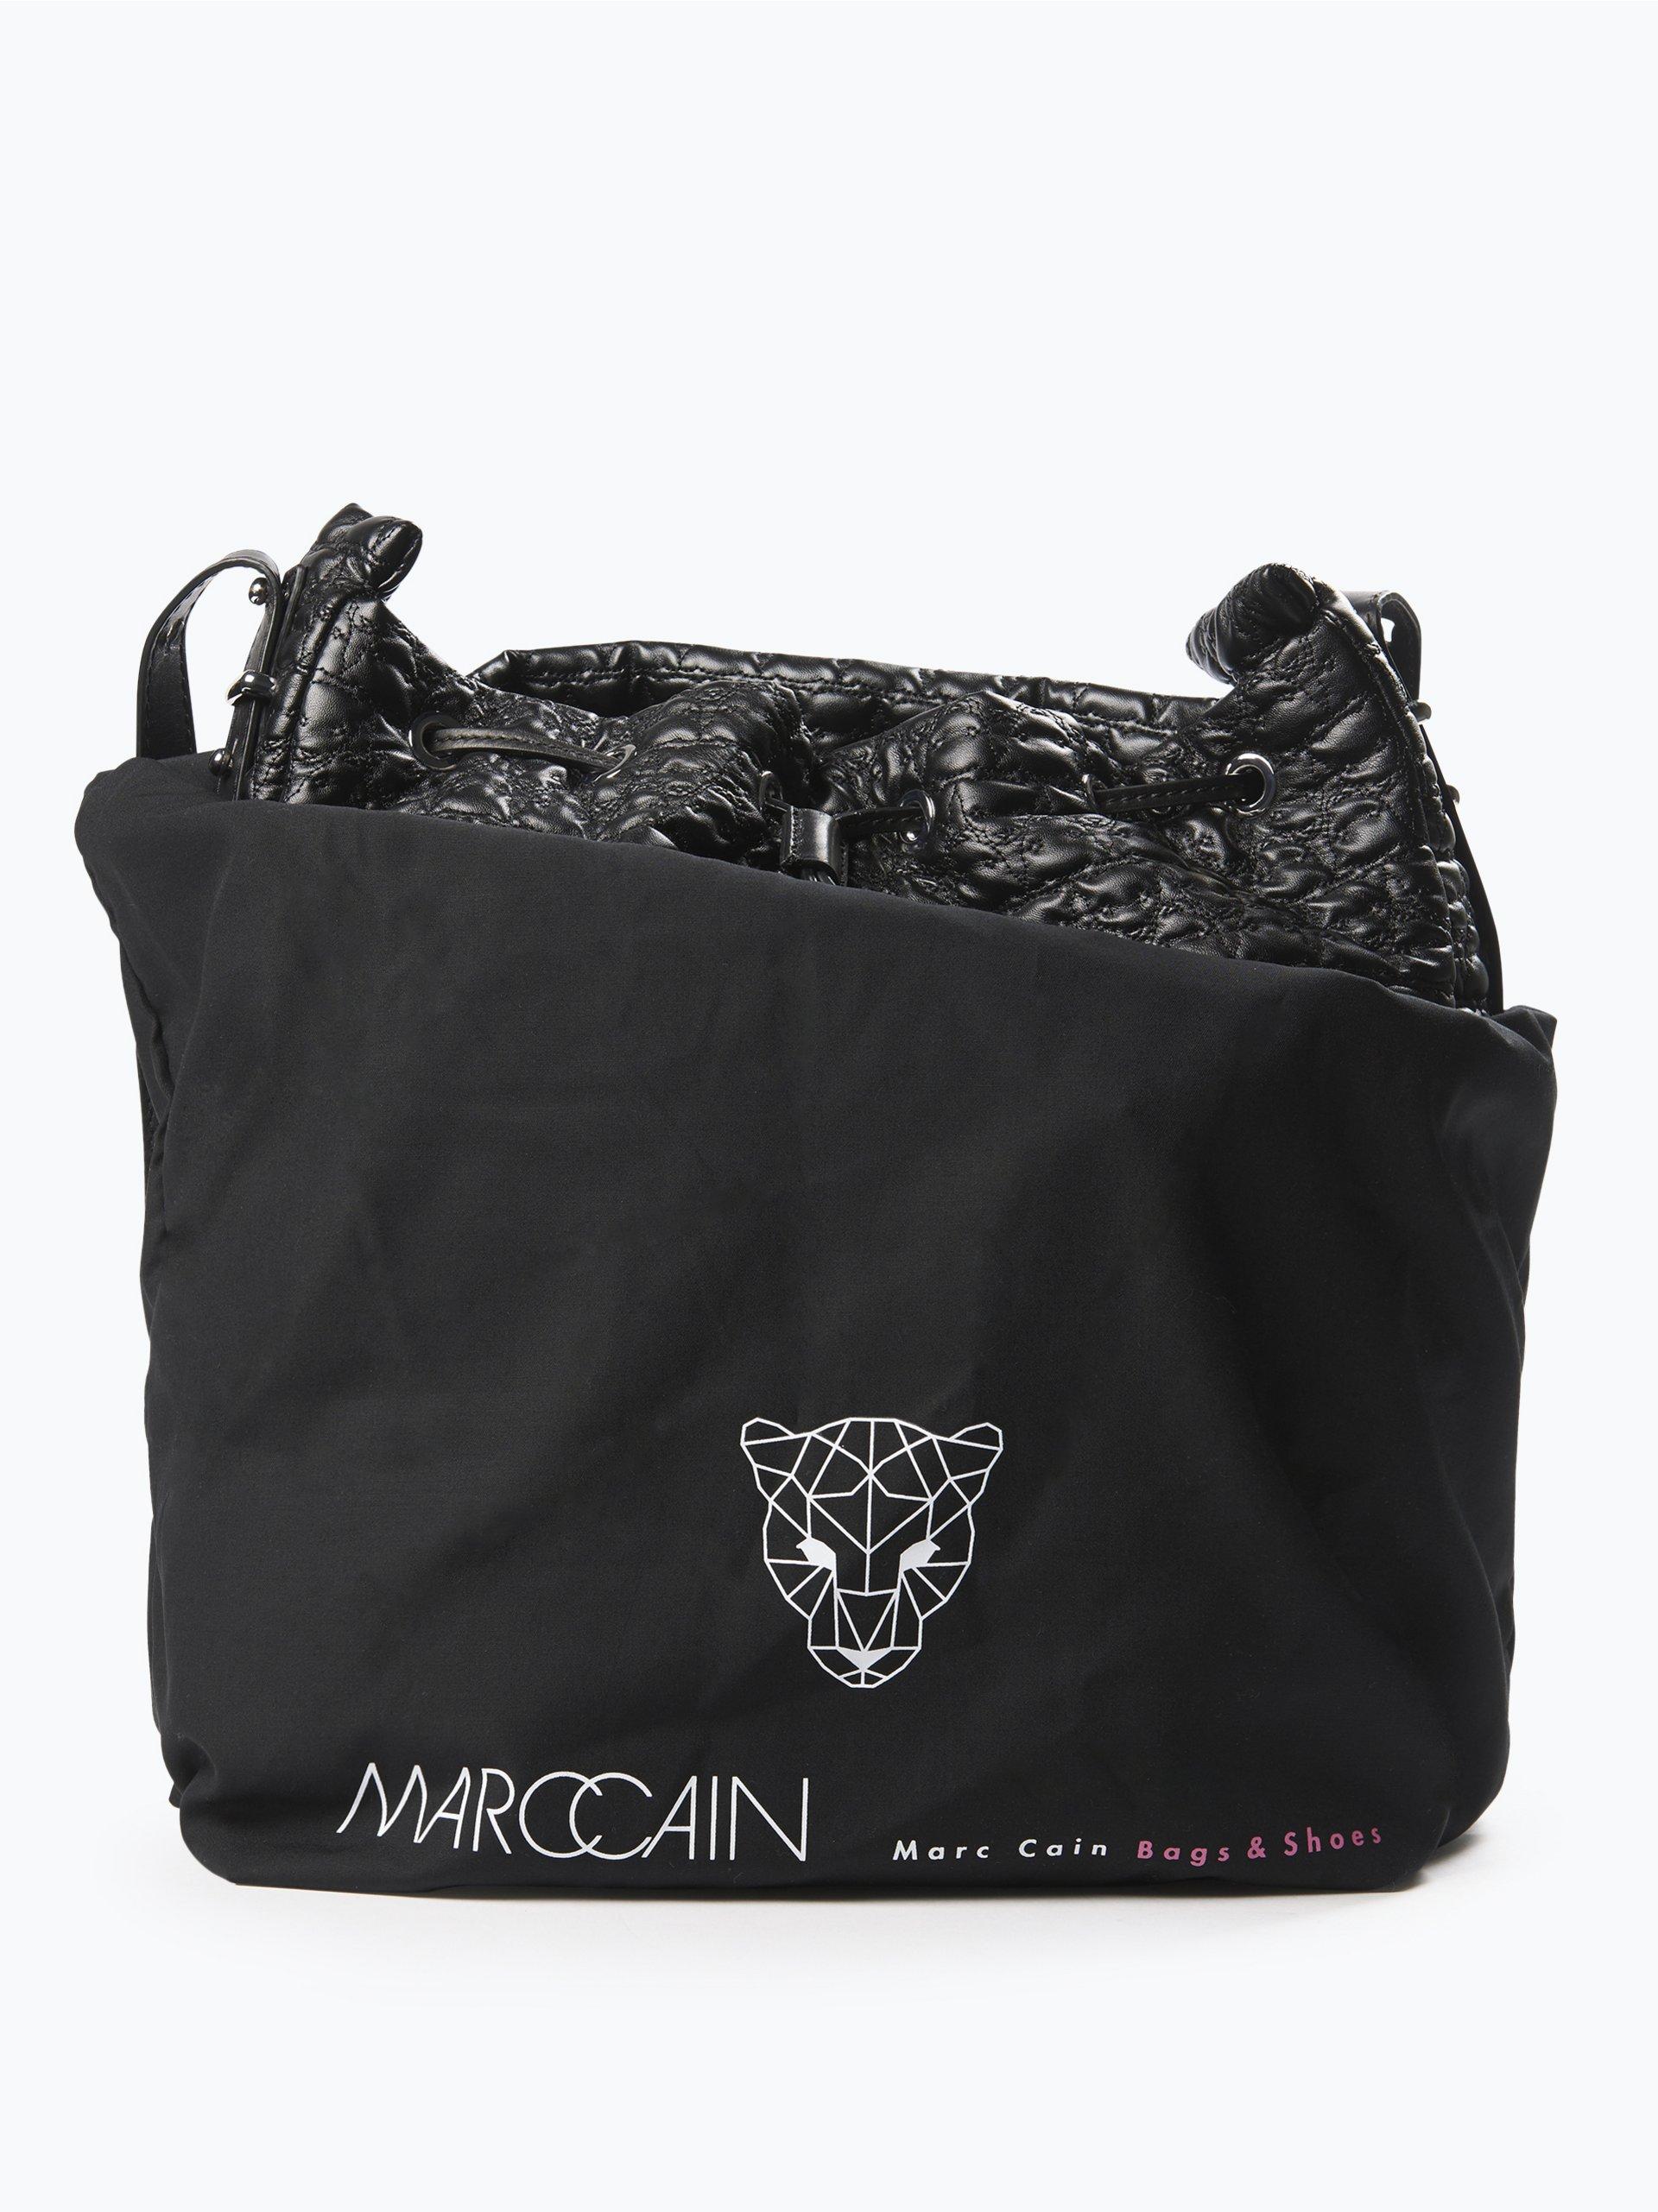 marc cain bags shoes damen tasche in leder optik schwarz uni online kaufen peek und. Black Bedroom Furniture Sets. Home Design Ideas